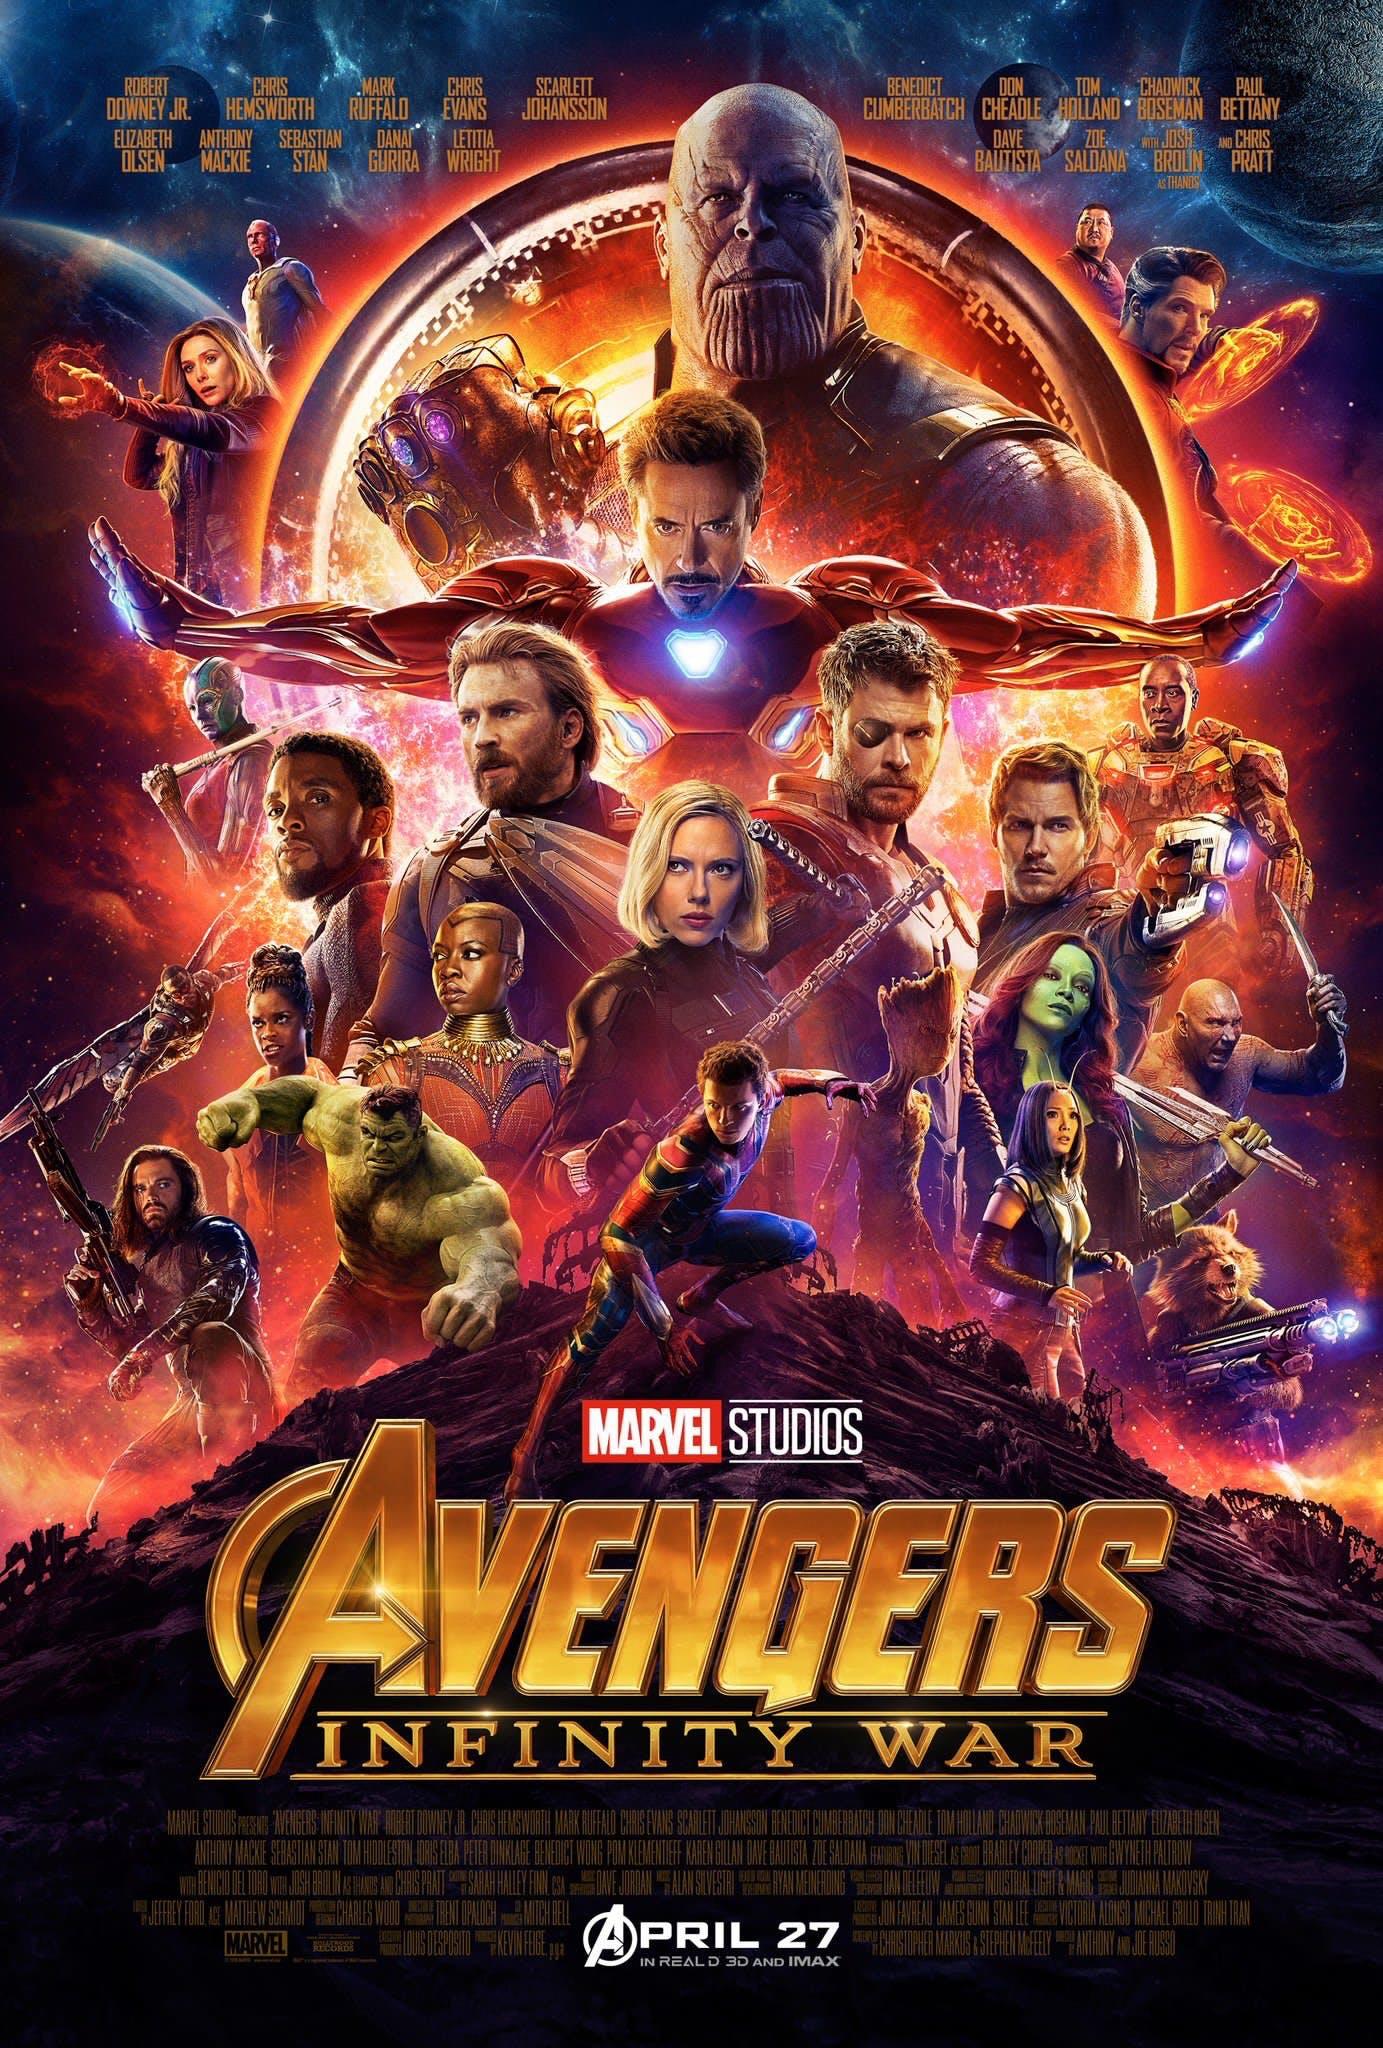 Bildergebnis für avengers infinity war plakat